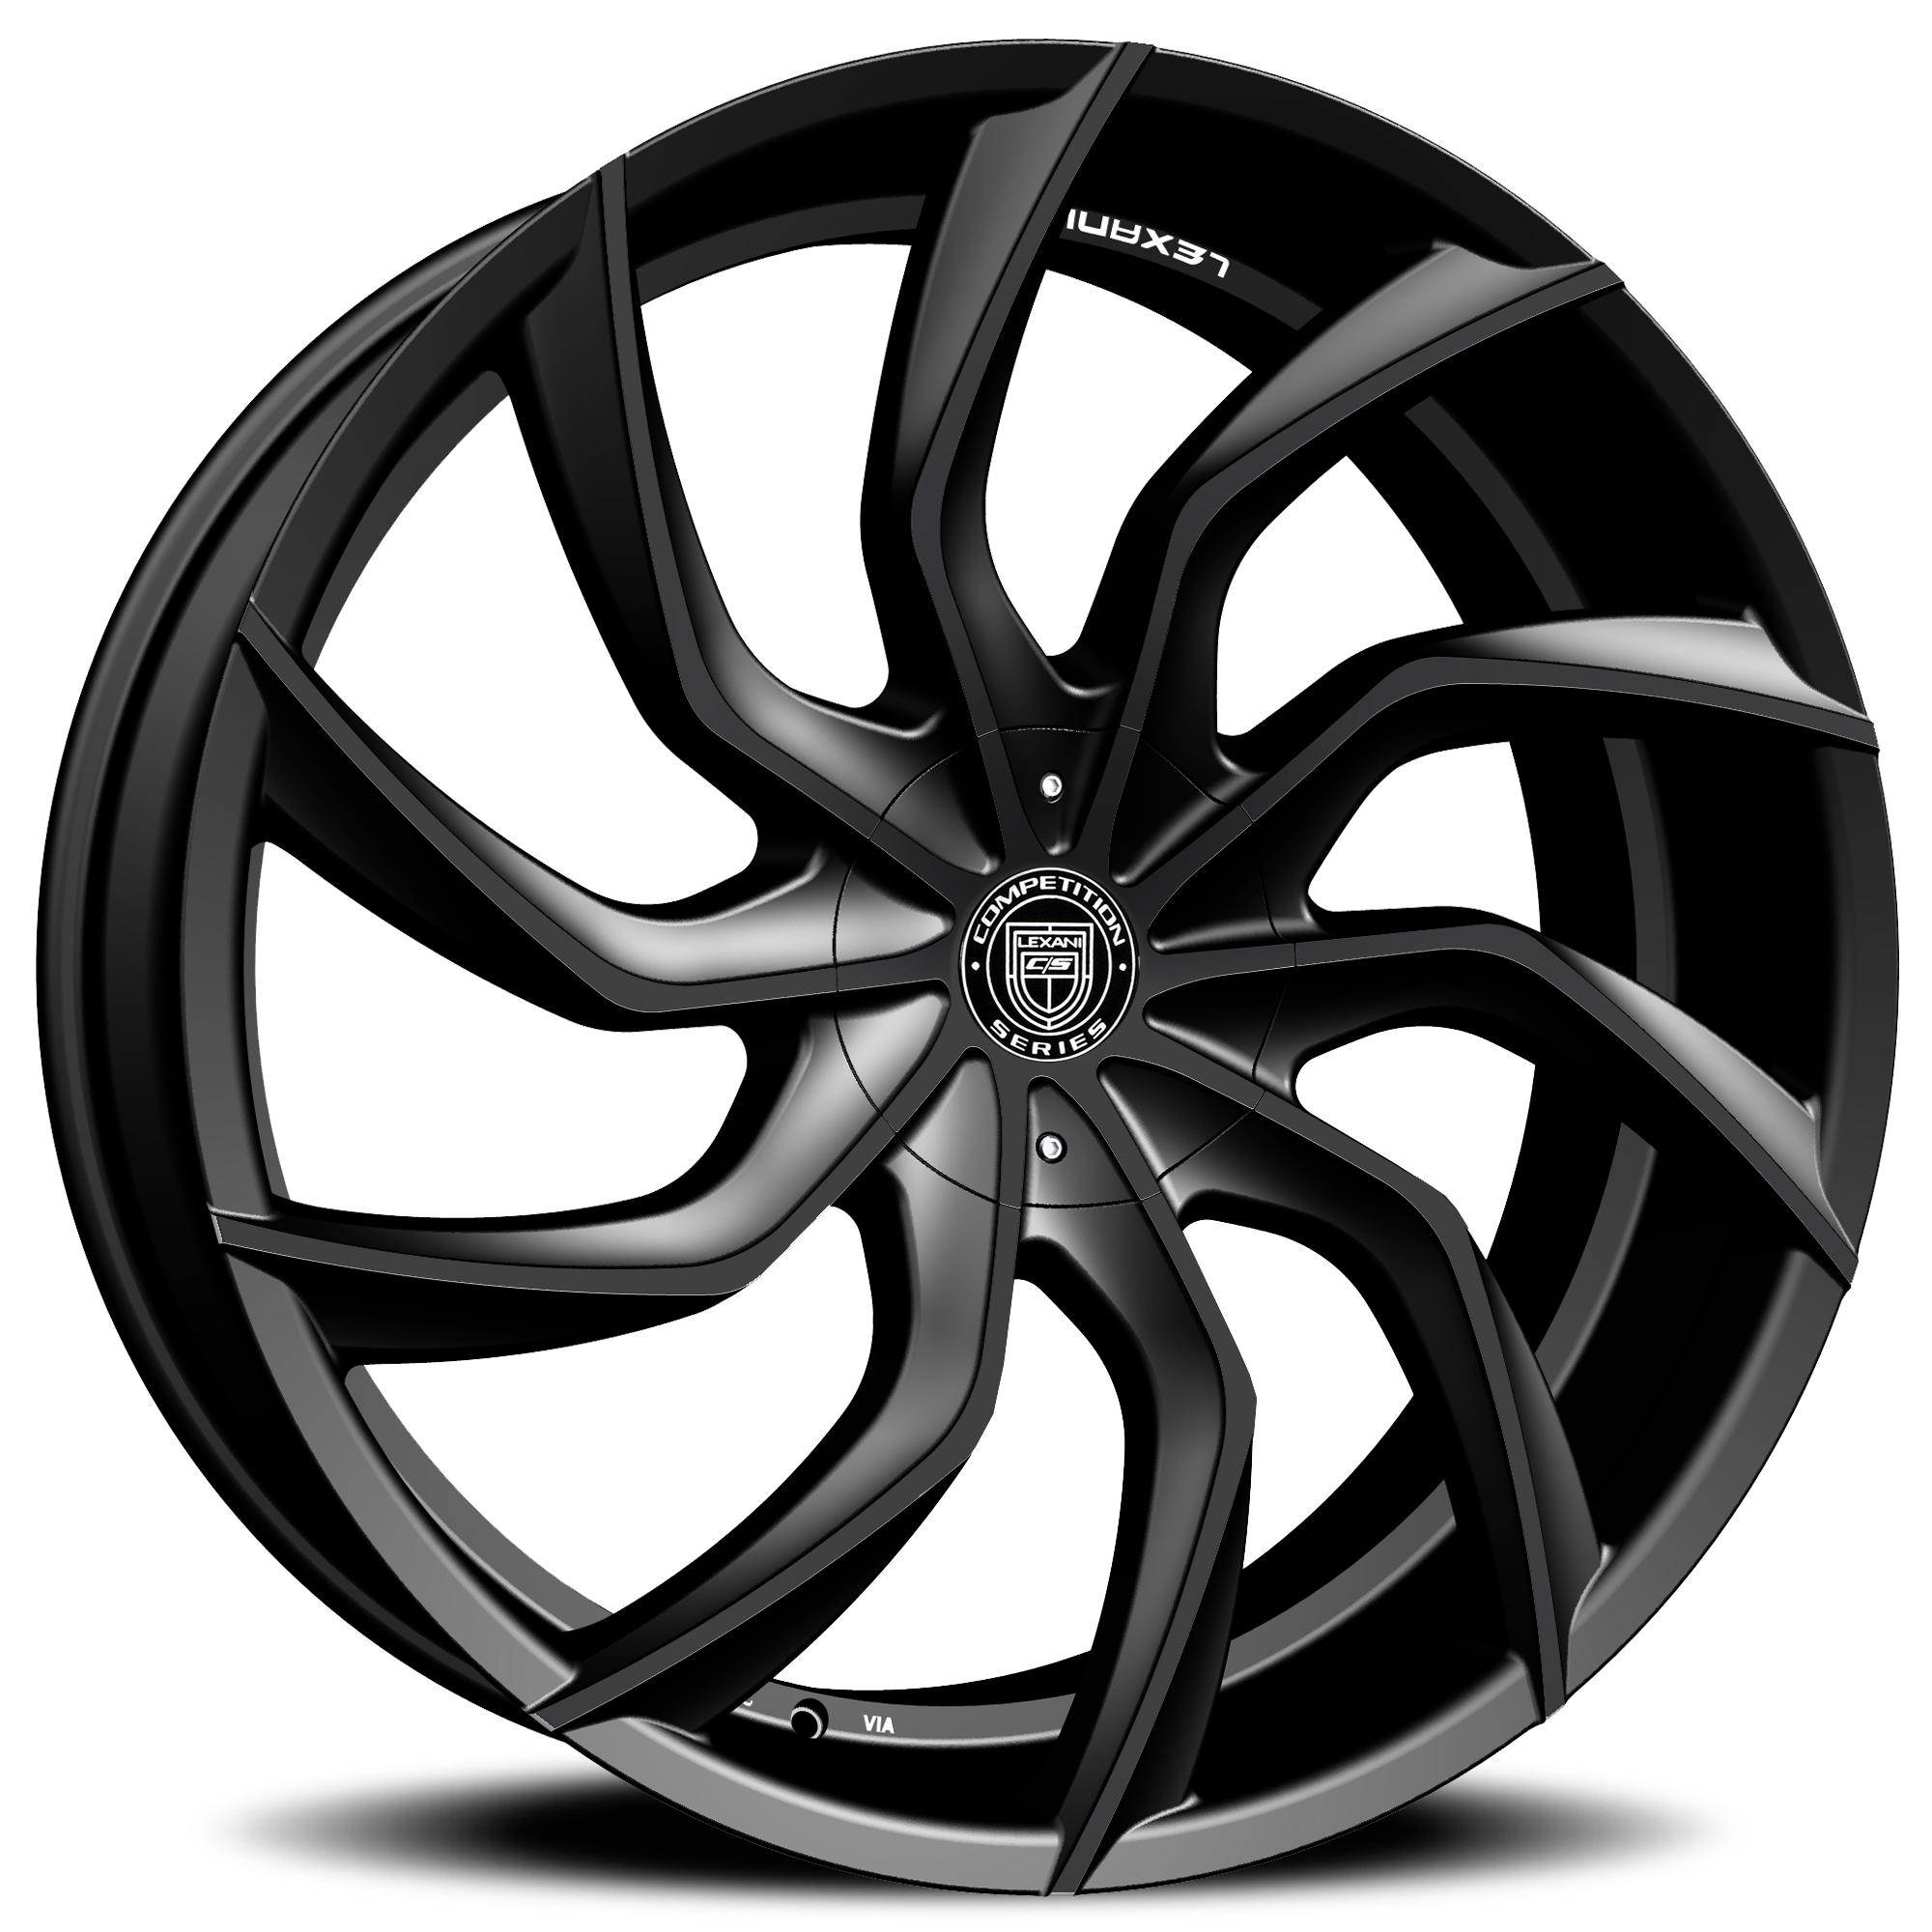 Lexani Wheels, Ekko Media web design, video production and marketing